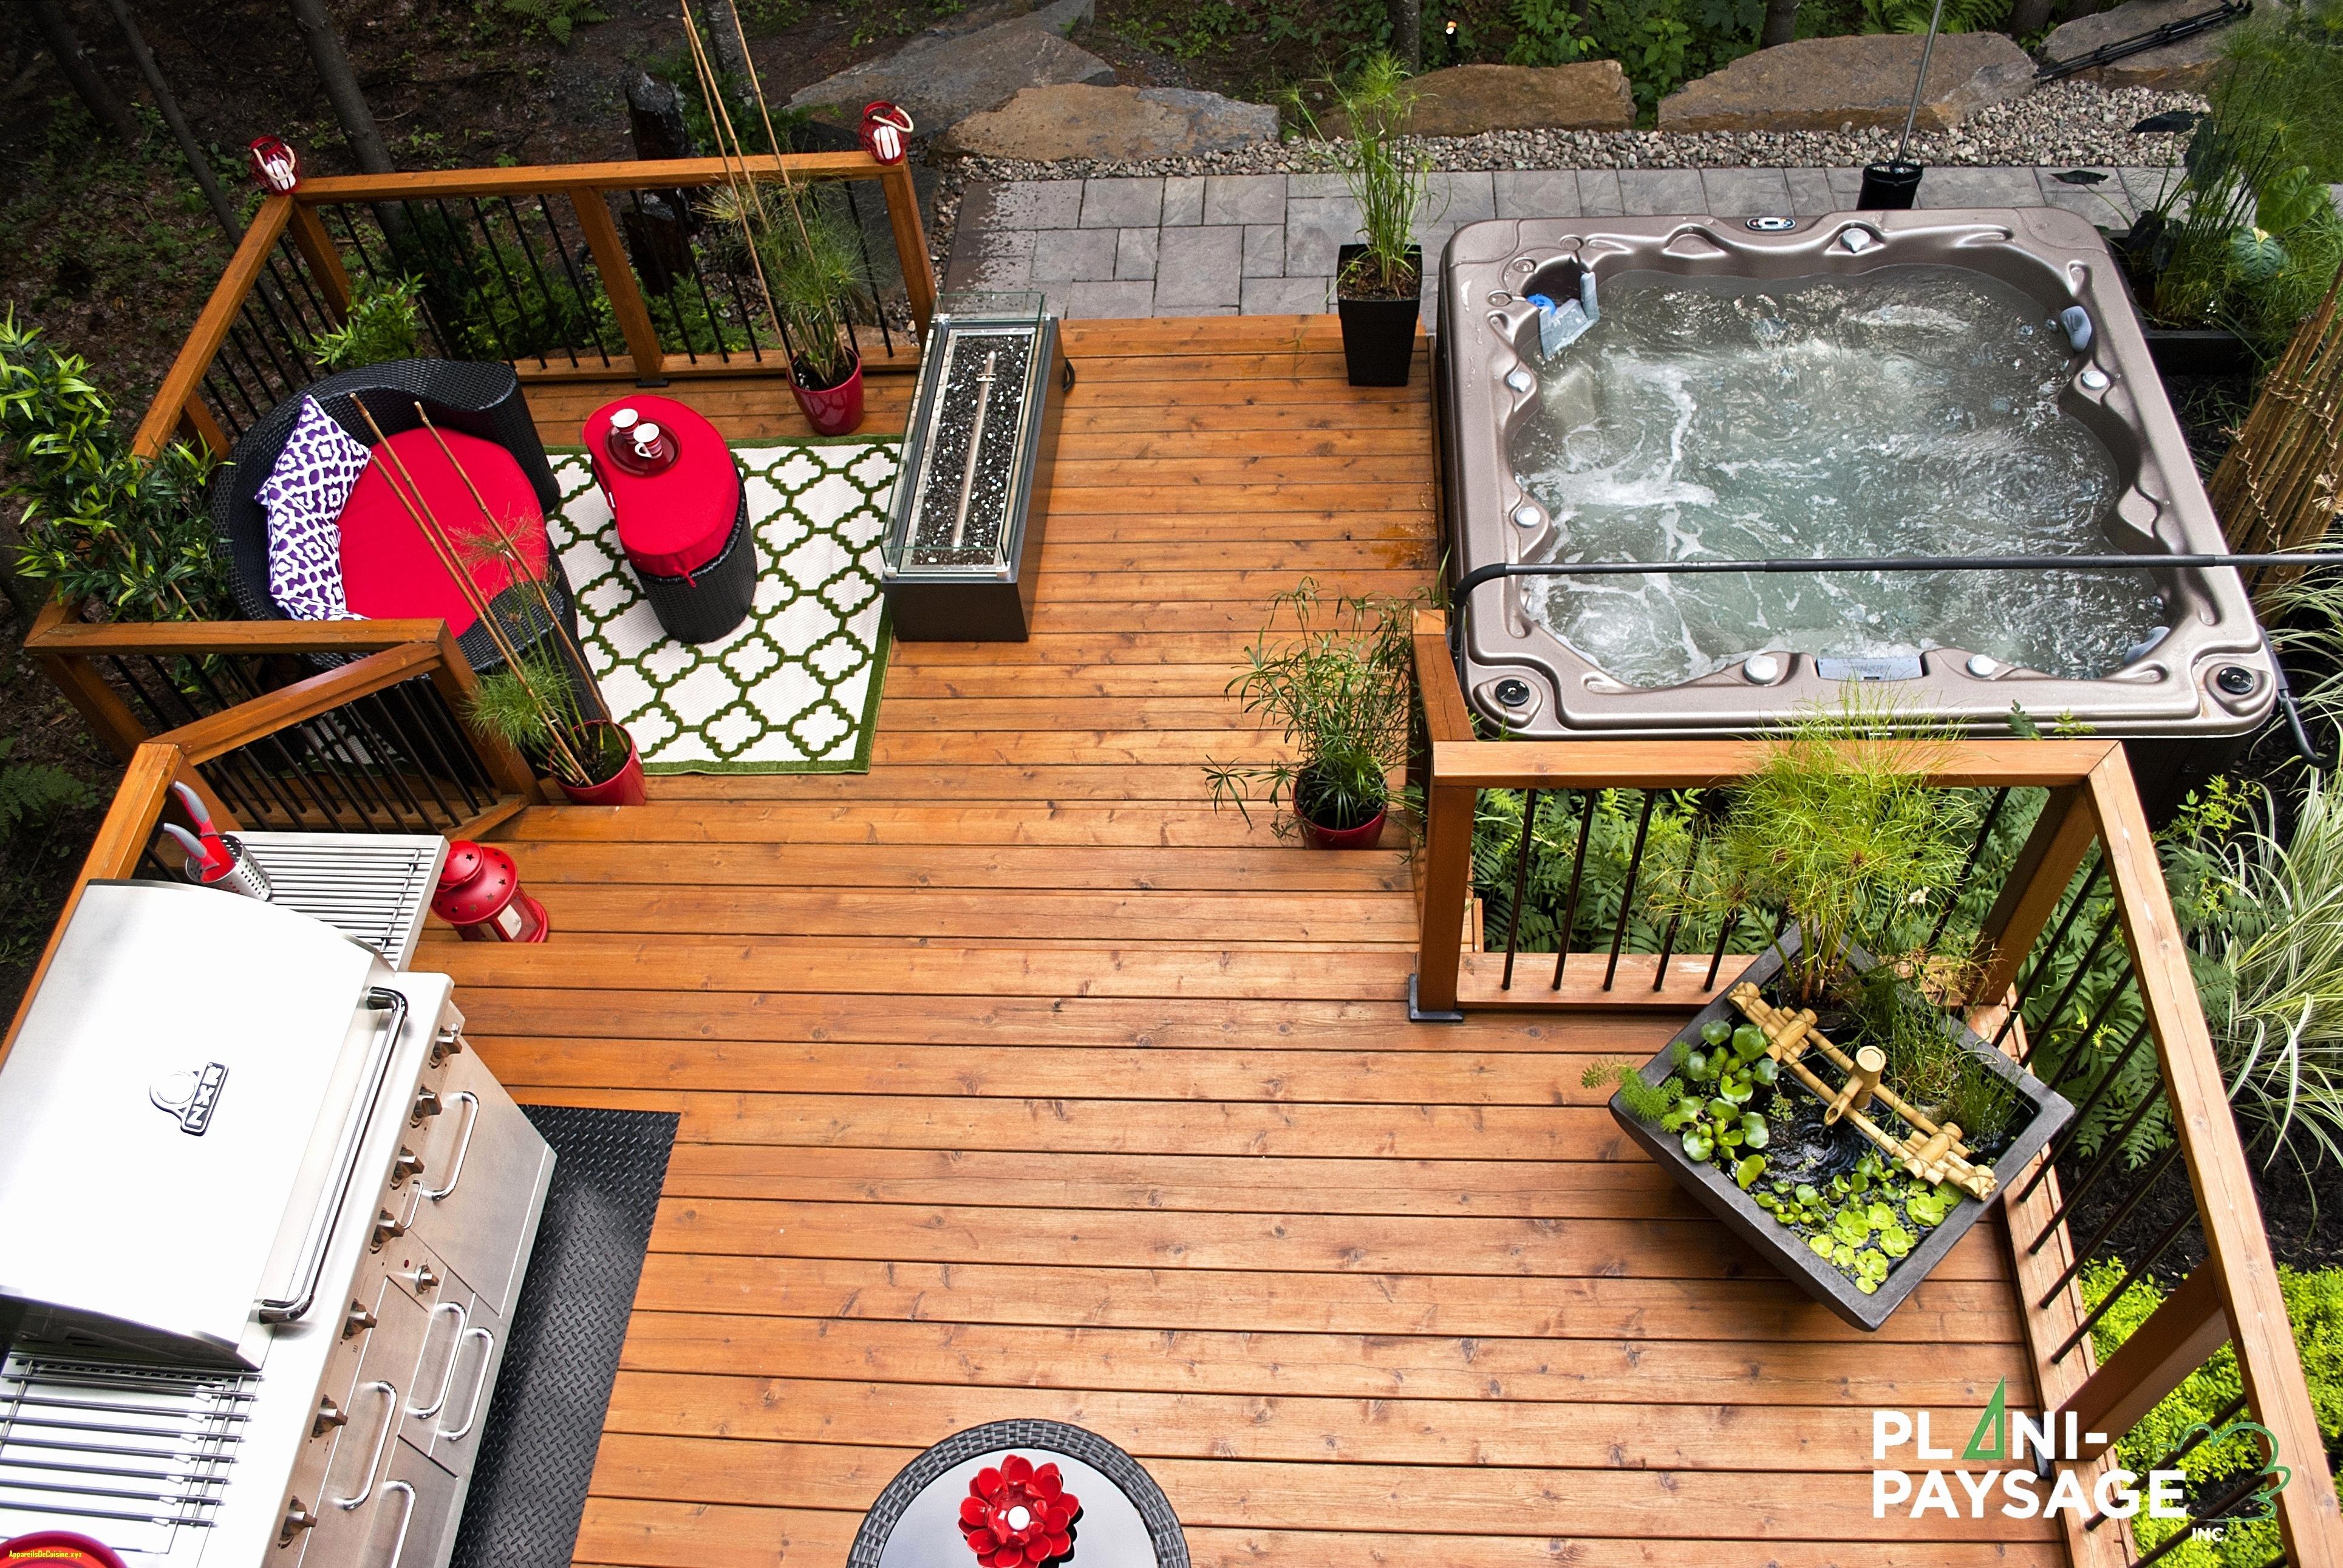 Jardin Japonais Minecraft Frais Image Barriere Jardin Meilleur Au Jardin Inspirant Cloture Jardin 0d